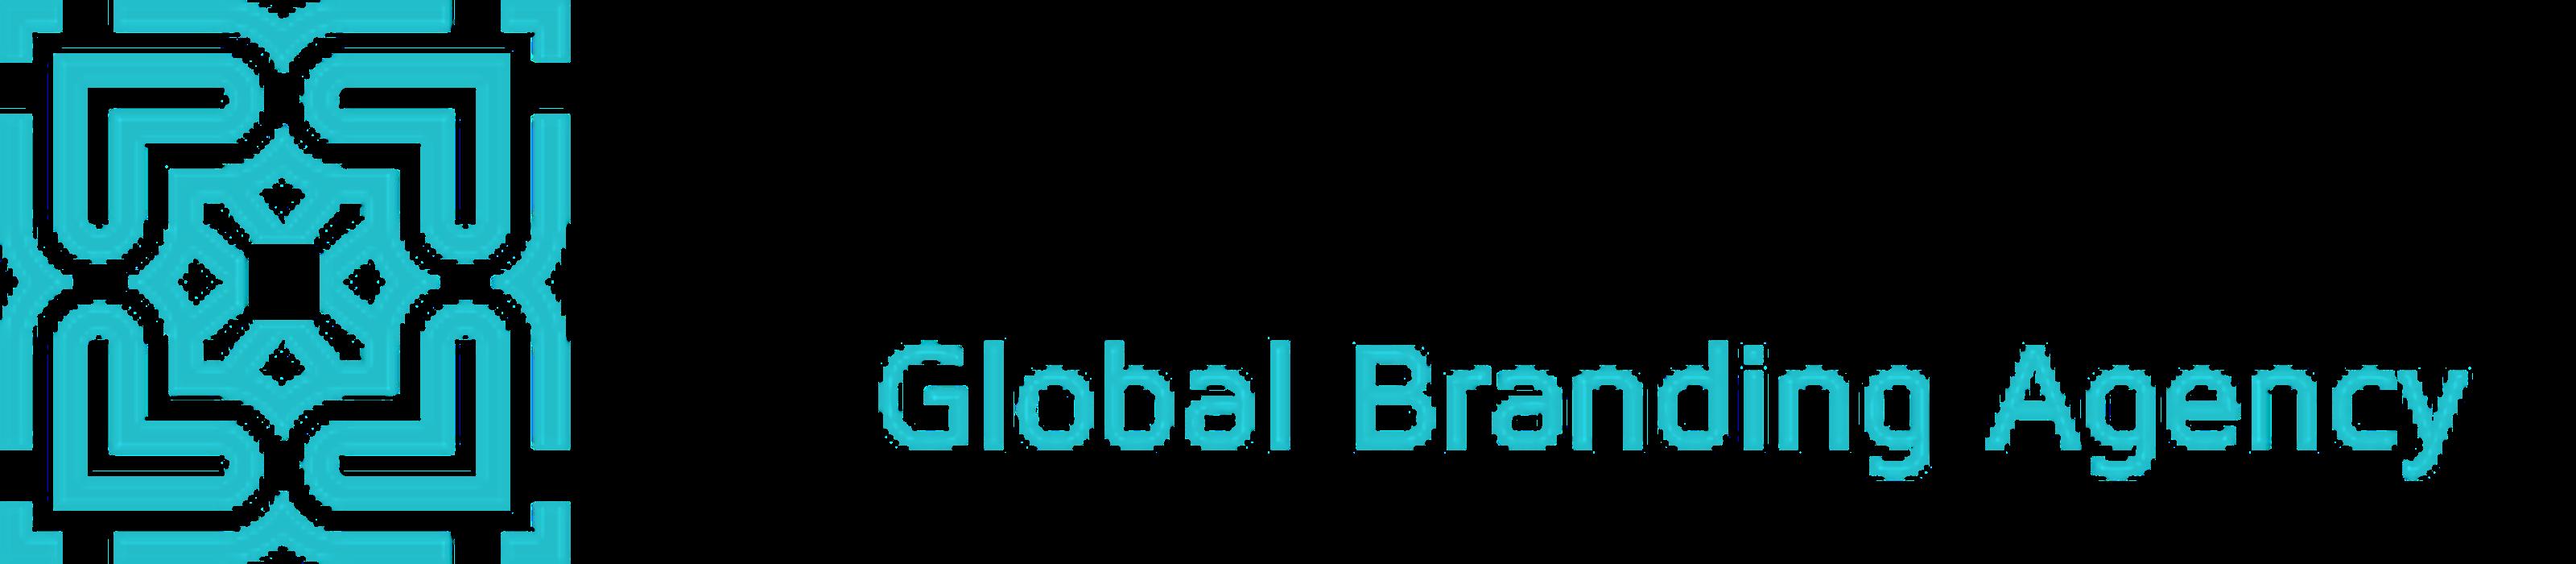 We Kinnect Global Branding Agency, LLC